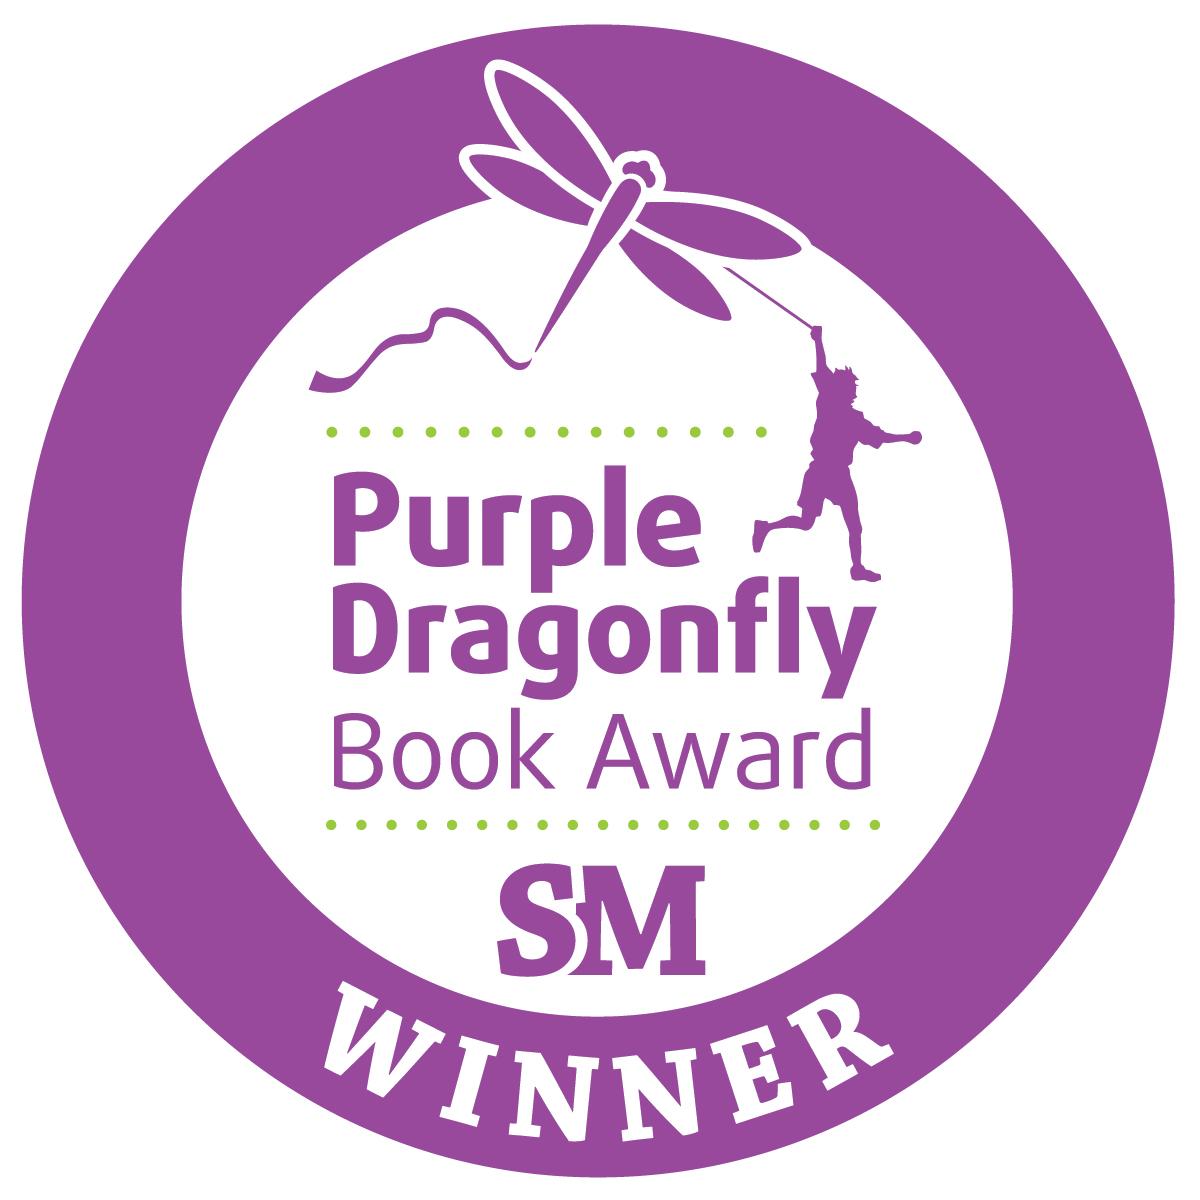 Myrtle - Purple Dragonfly Book Award